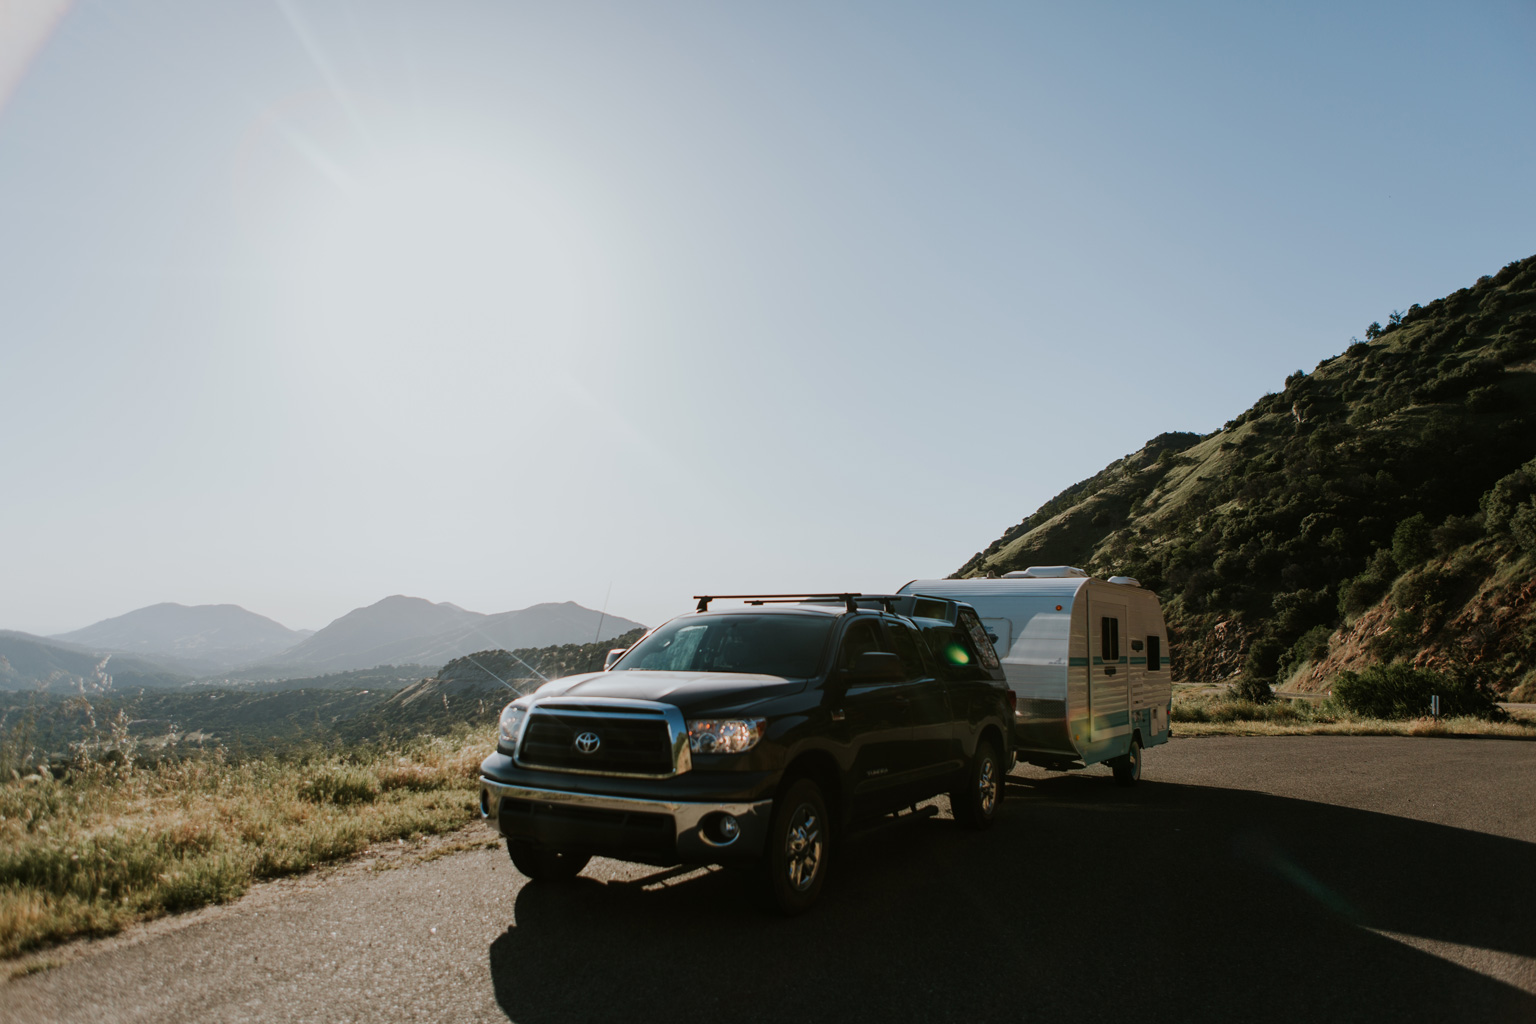 CindyGiovagnoli_Sequoia_KingsCanyon_National_Park_California_roadtrip_travel-004.jpg